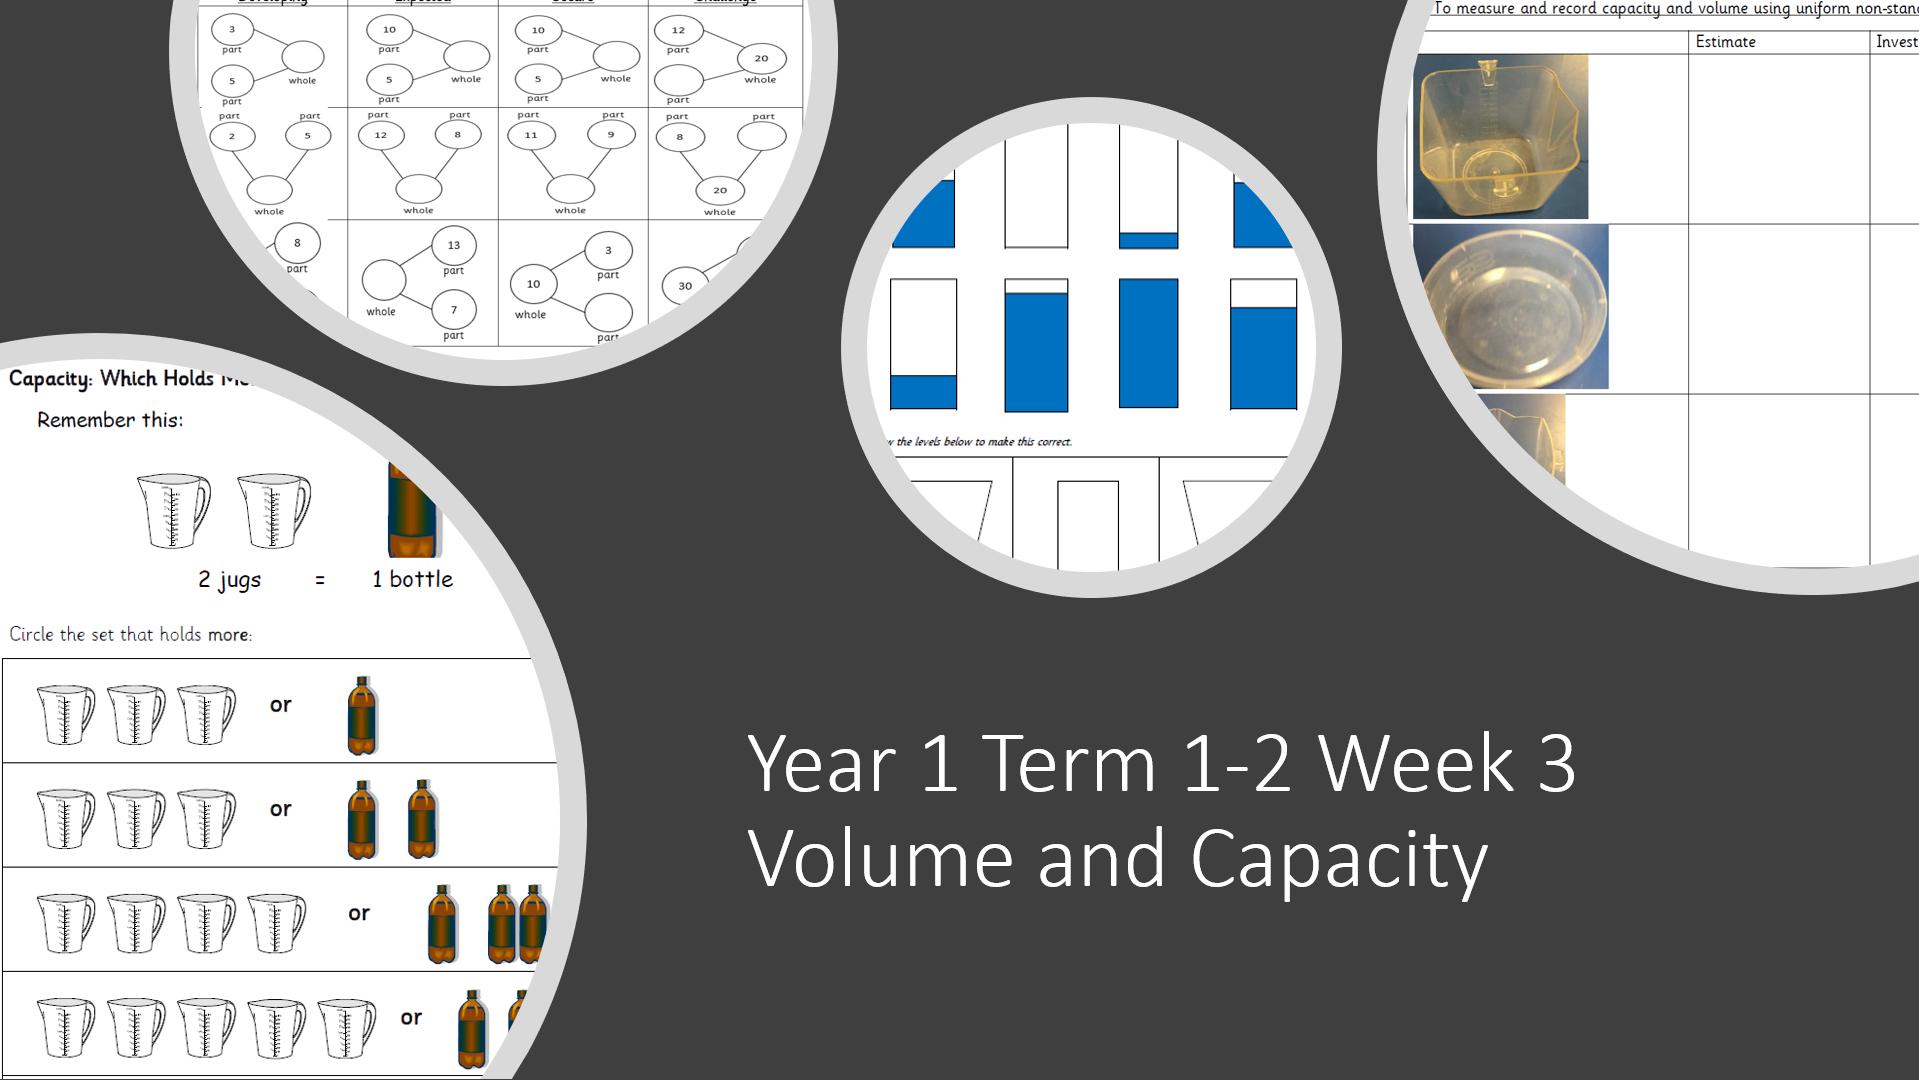 Year 1 Term 1-2 Week 3 Volume and Capacity